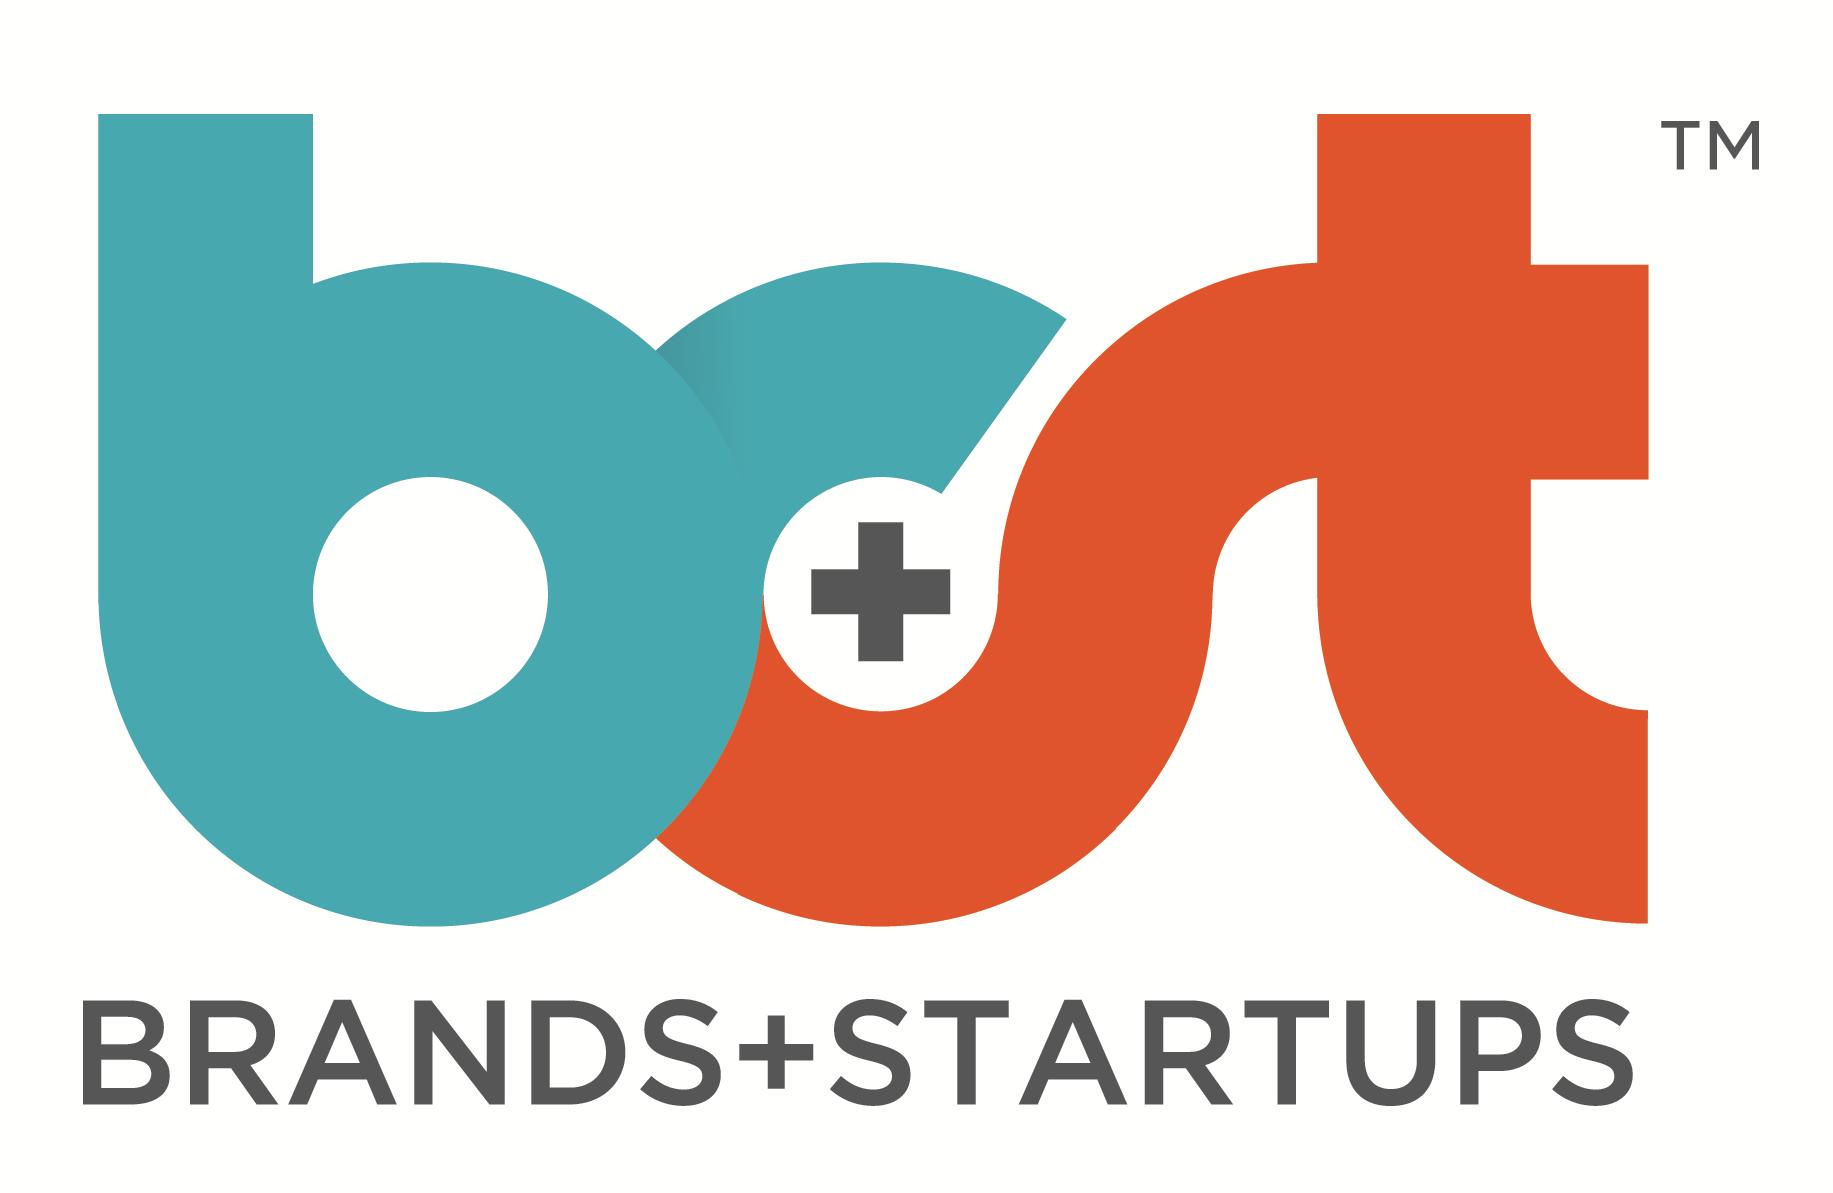 Brands+Startups